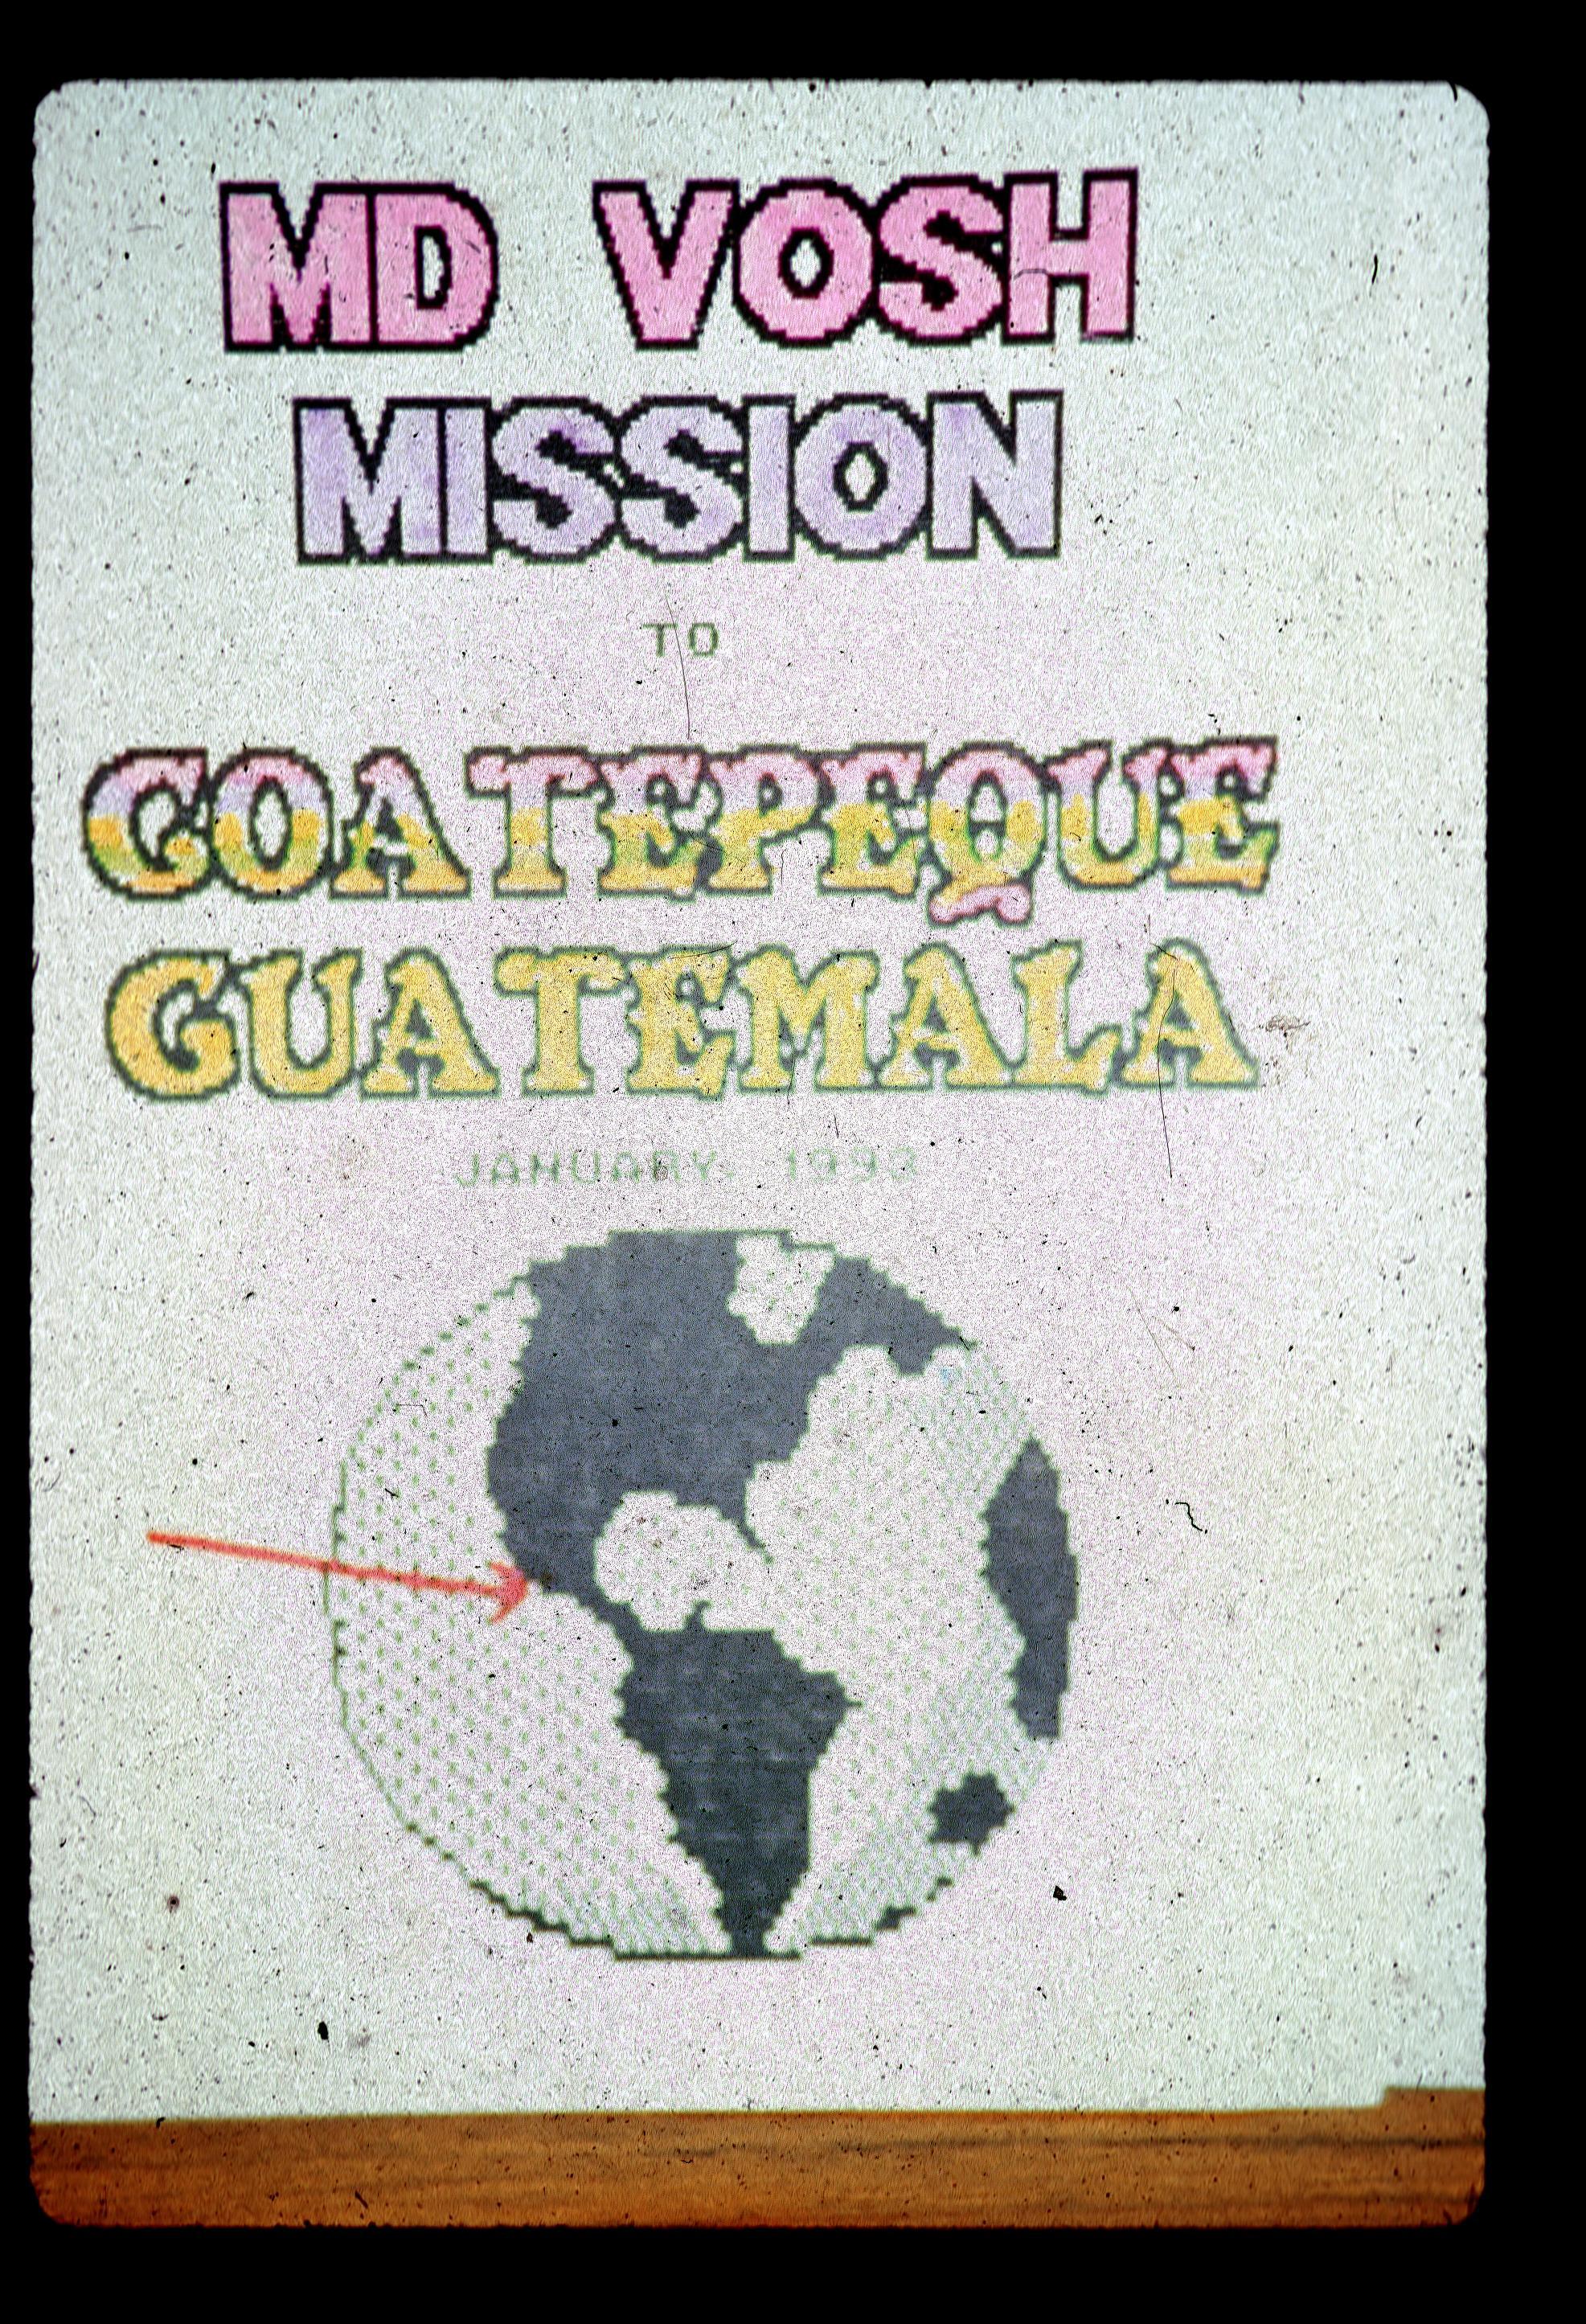 Coatepeque01.jpg